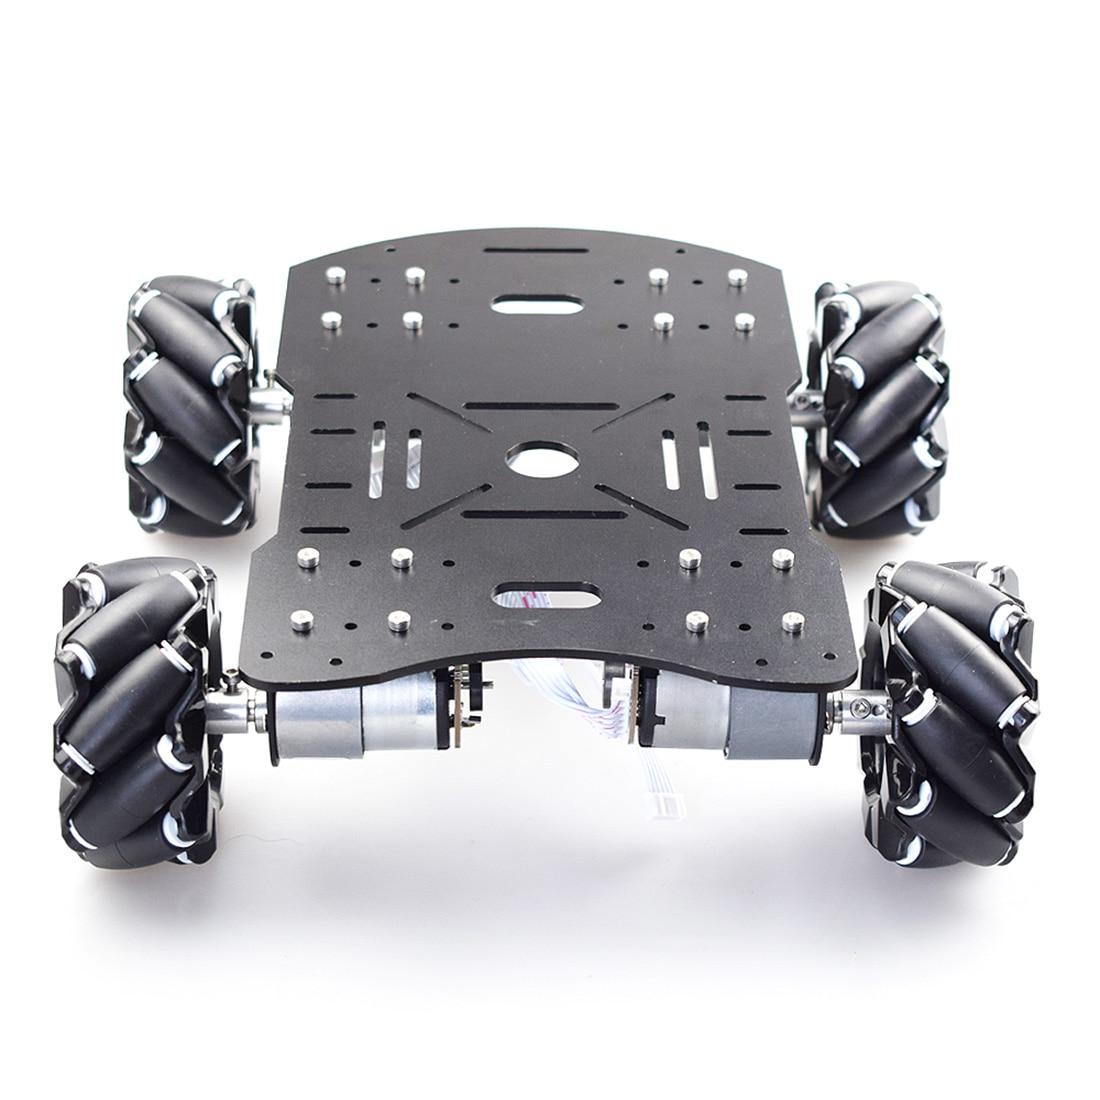 80mm Mecanum Acrylic Platform Omni-Directional Mecanum Wheel Robot Car With Arduino Electronic Control (Without Power Supply)